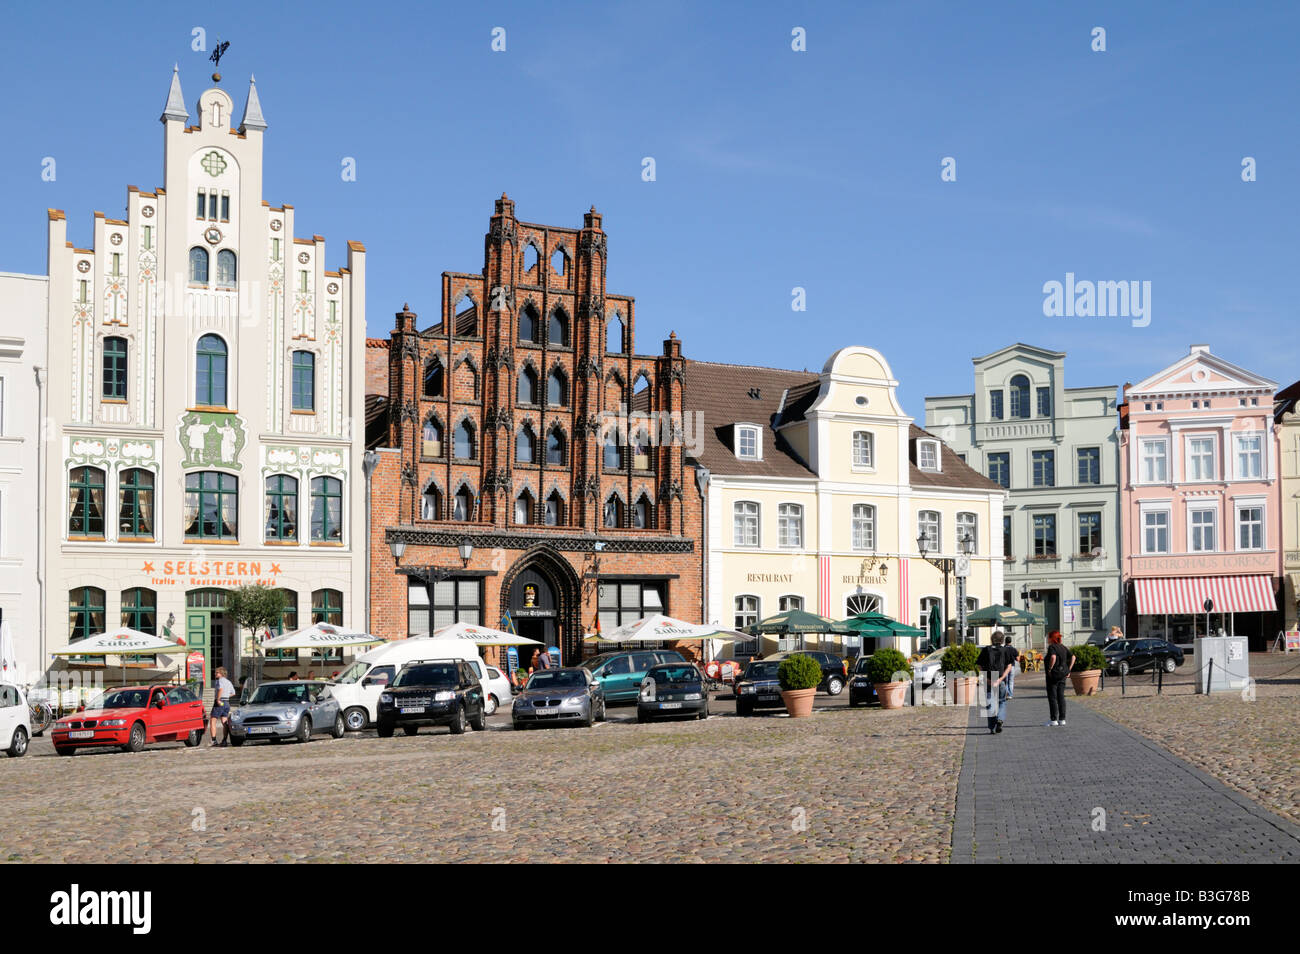 Marktplatz in Wismar Mecklenburg Vorpommern Deutschland Market square in Wismar Mecklenburg Western Pomerania Germany - Stock Image